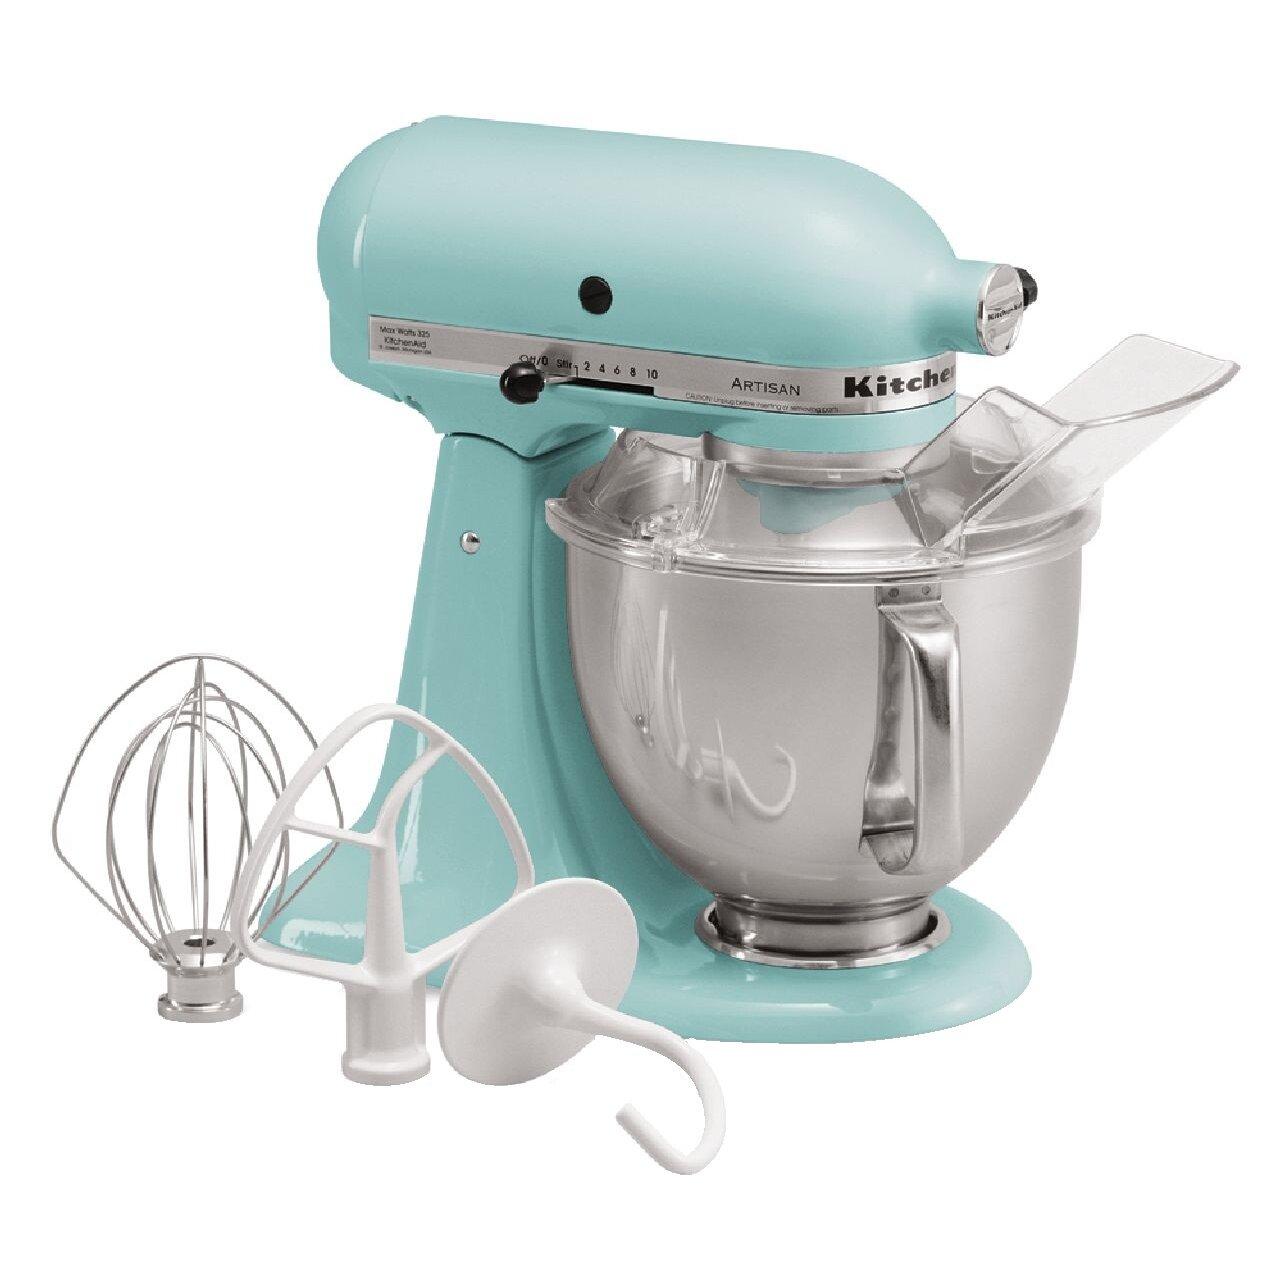 Kitchenaid kitchenaid artisan series 5 qt stand mixer with pouring shield reviews wayfair - Kitchenaid artisan qt stand mixer sale ...